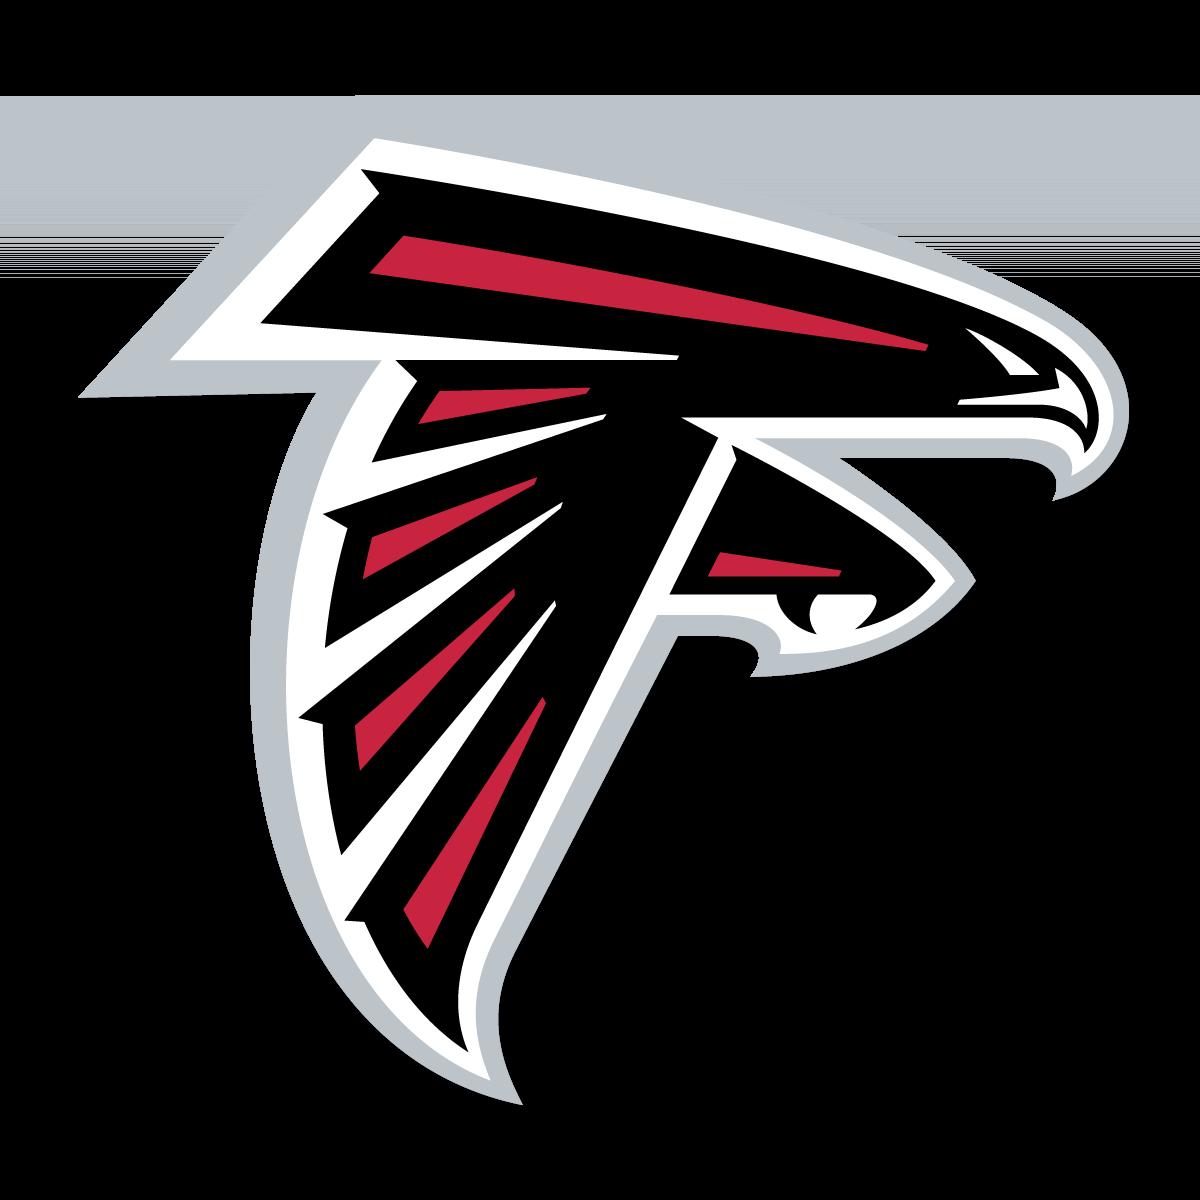 Atlanta Falcons NFL logo